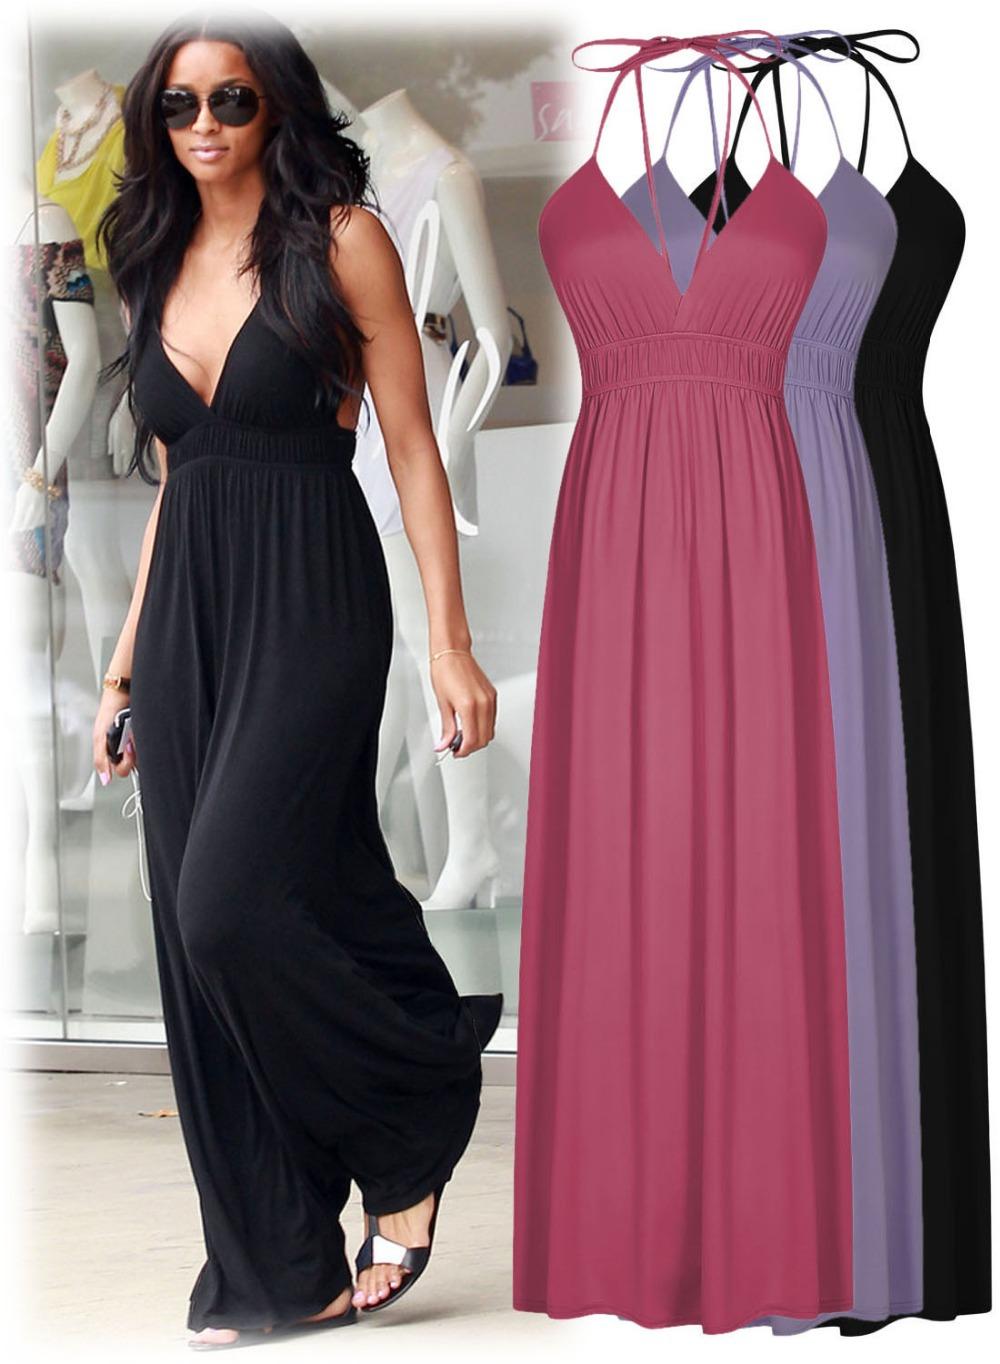 Hawaiian Evening Dresses - Cocktail Dresses 2016